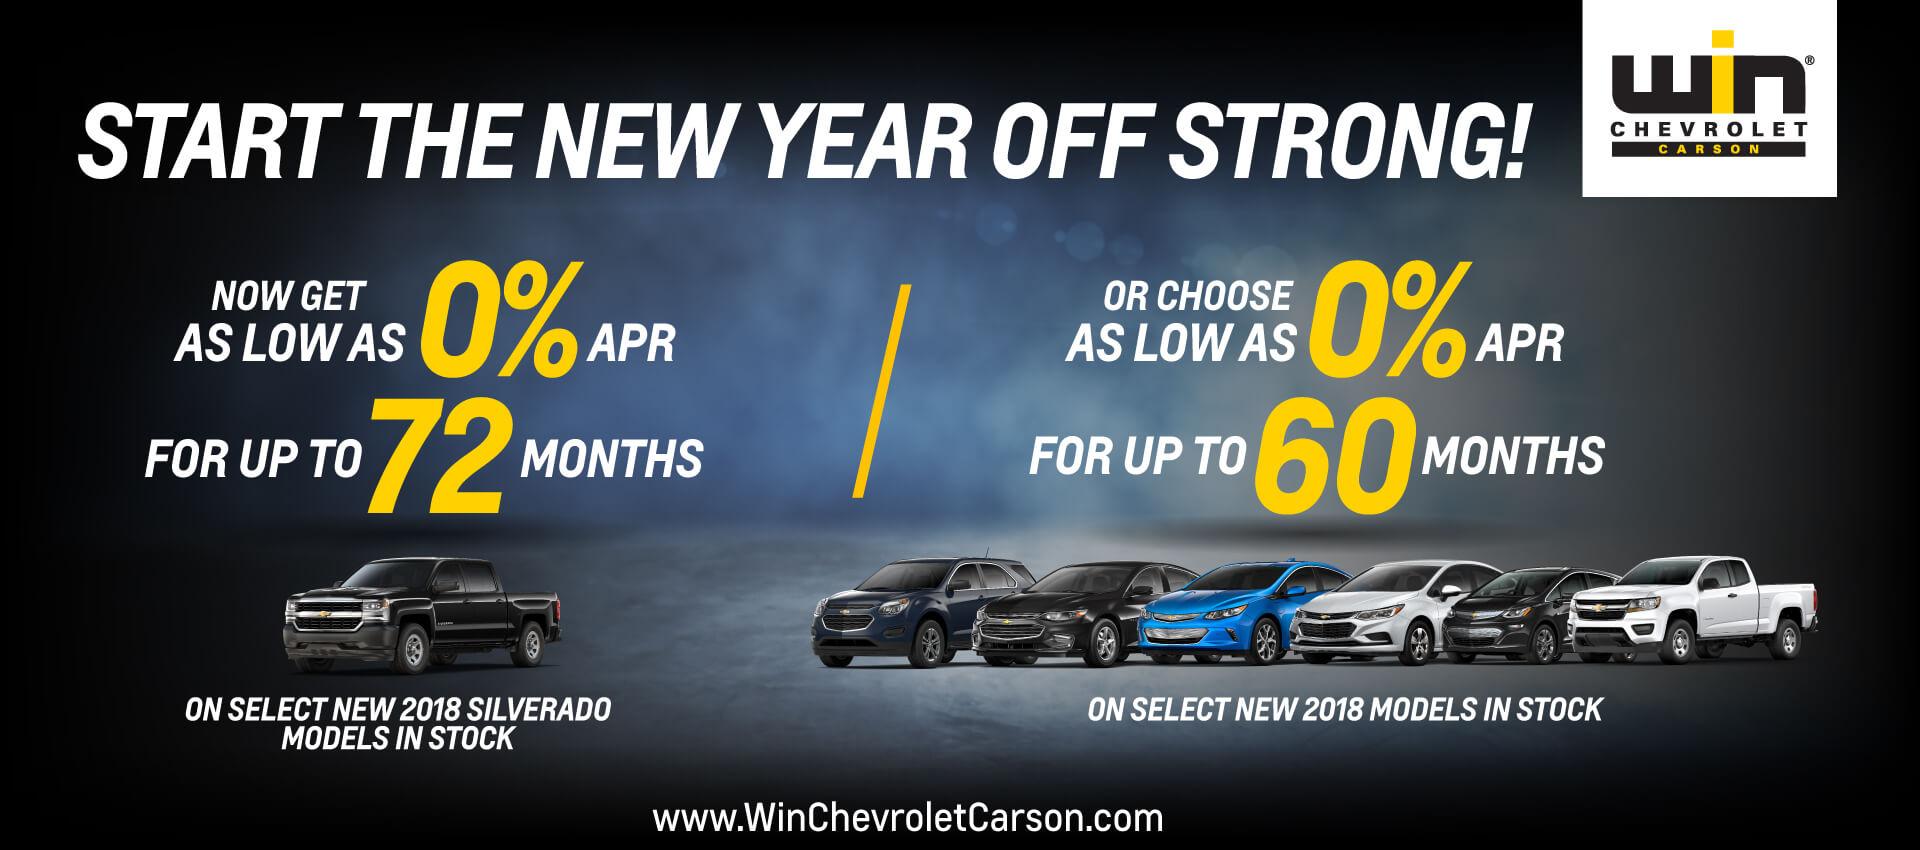 Win Chevy Start The Year